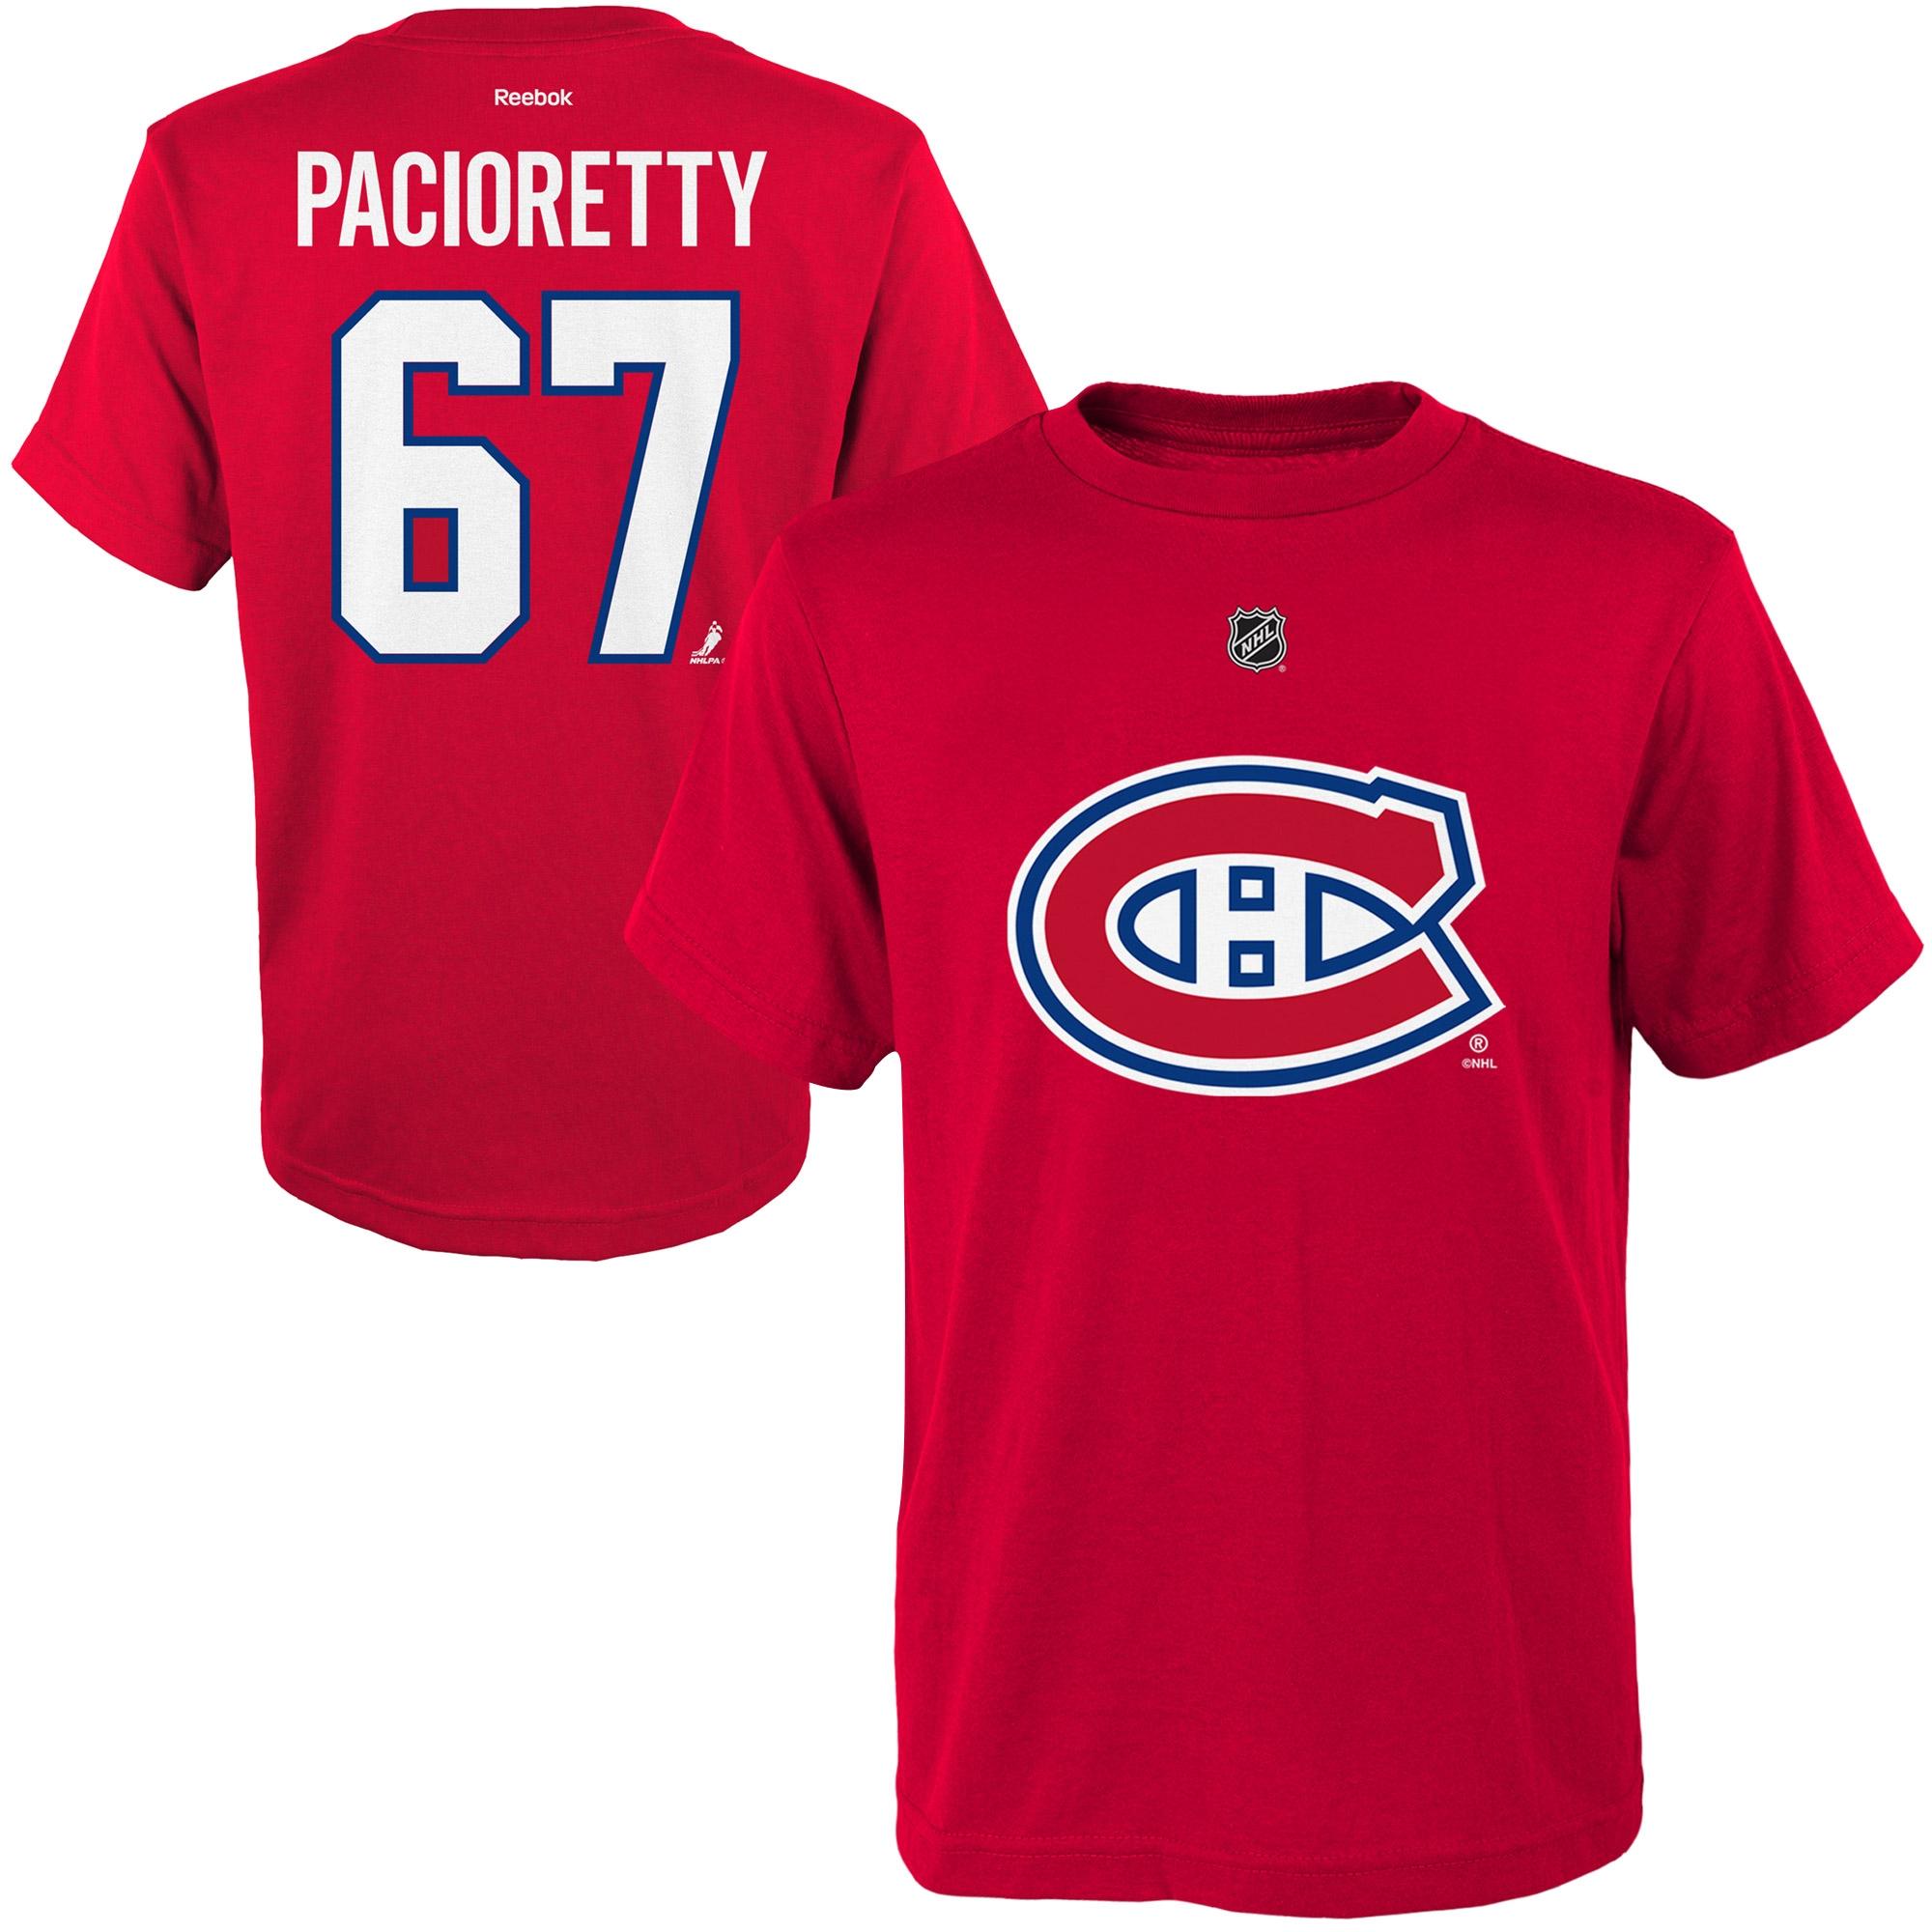 Reebok Dětské tričko Max Pacioretty Montreal Canadiens NHL Name & Number Velikost: Dětské M (9 - 11 let)